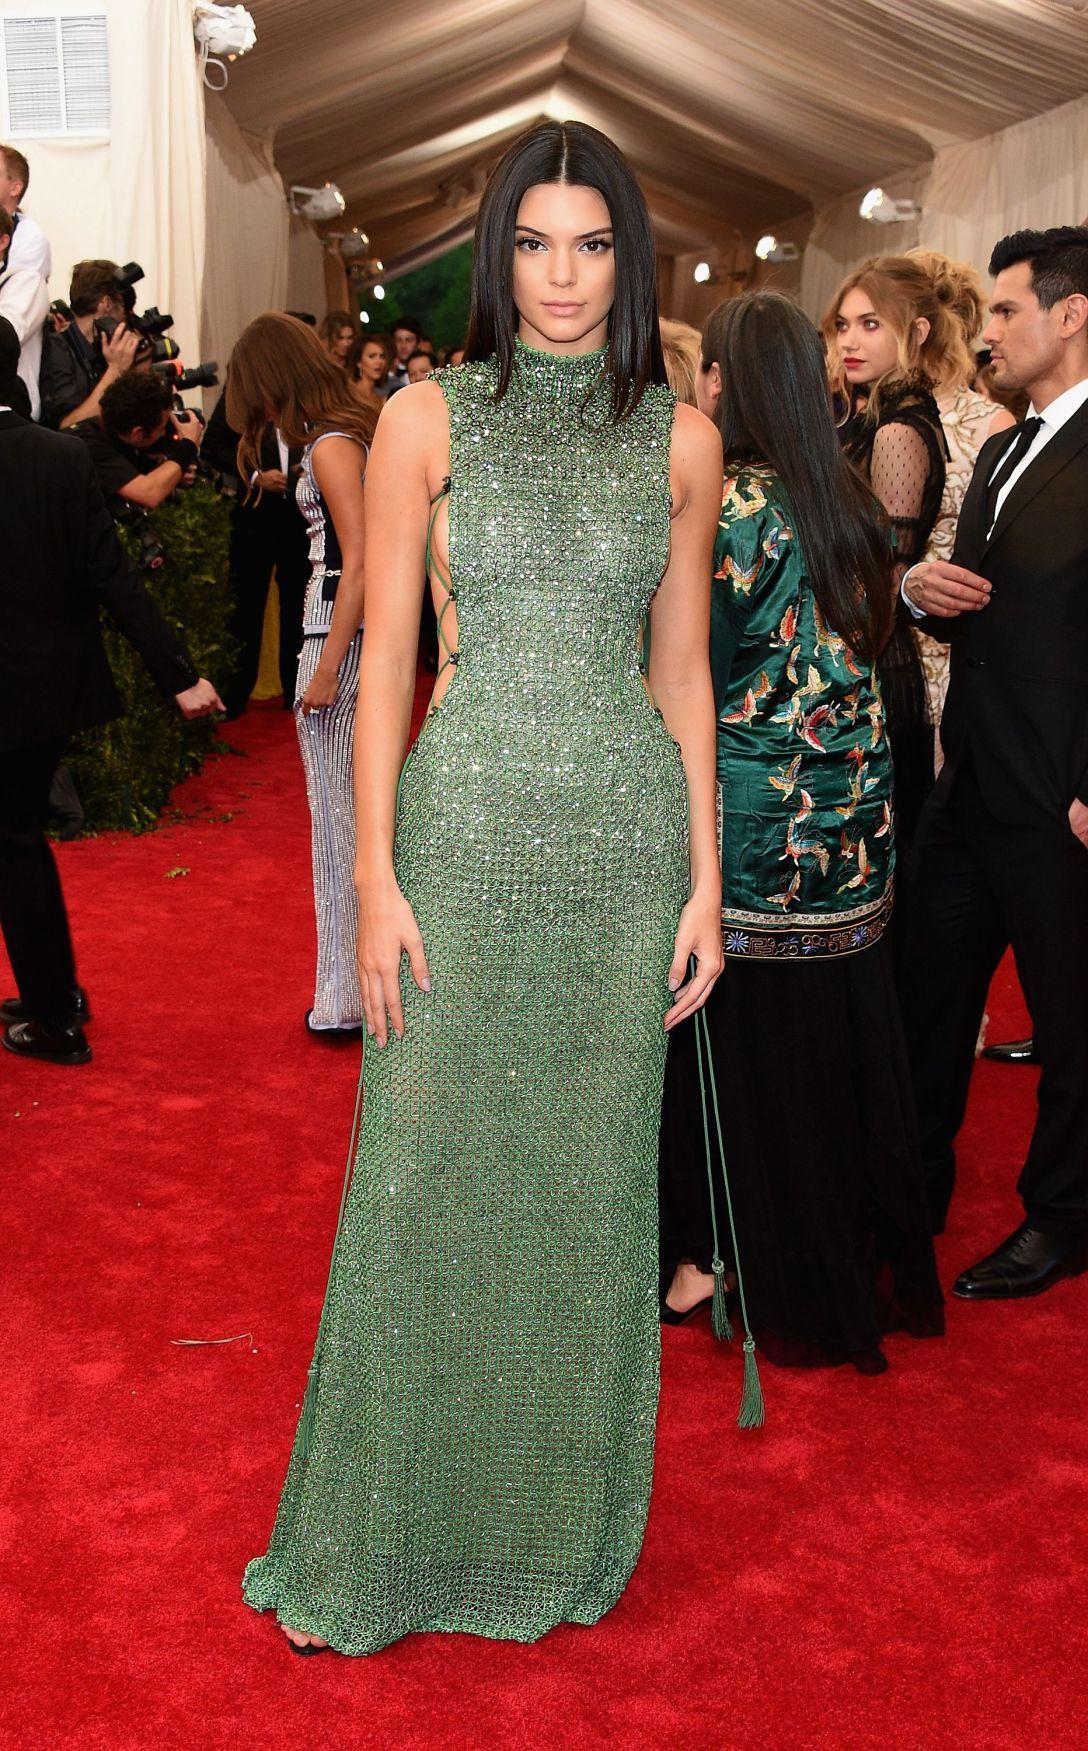 Kendall Jenner in Calvin Klein 2015